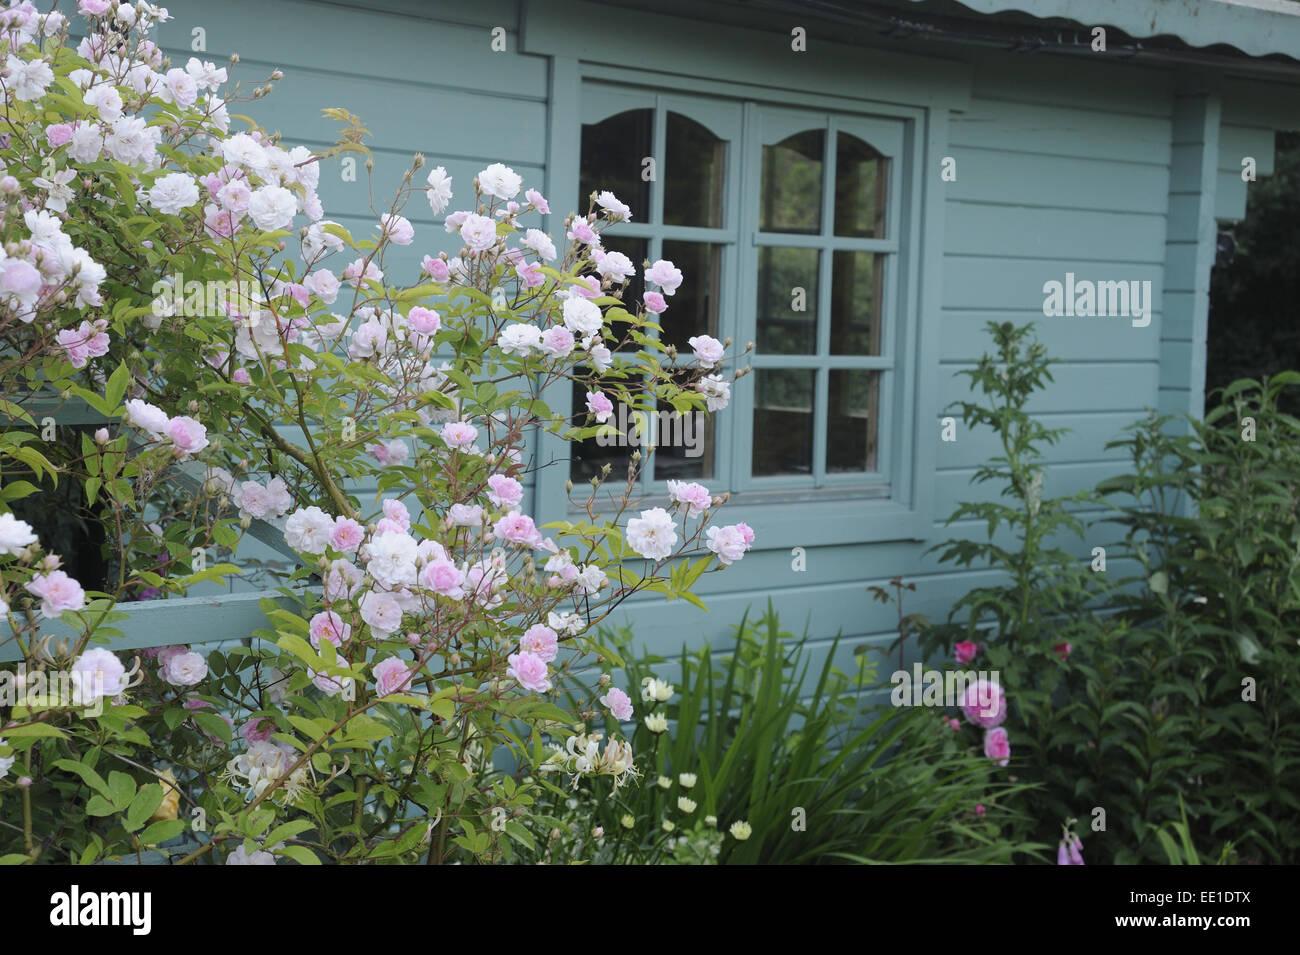 Cultivated Rambling Rose (Rosa sp.) 'David Austin', flowering, growing on trellis beside wooden summerhouse - Stock Image